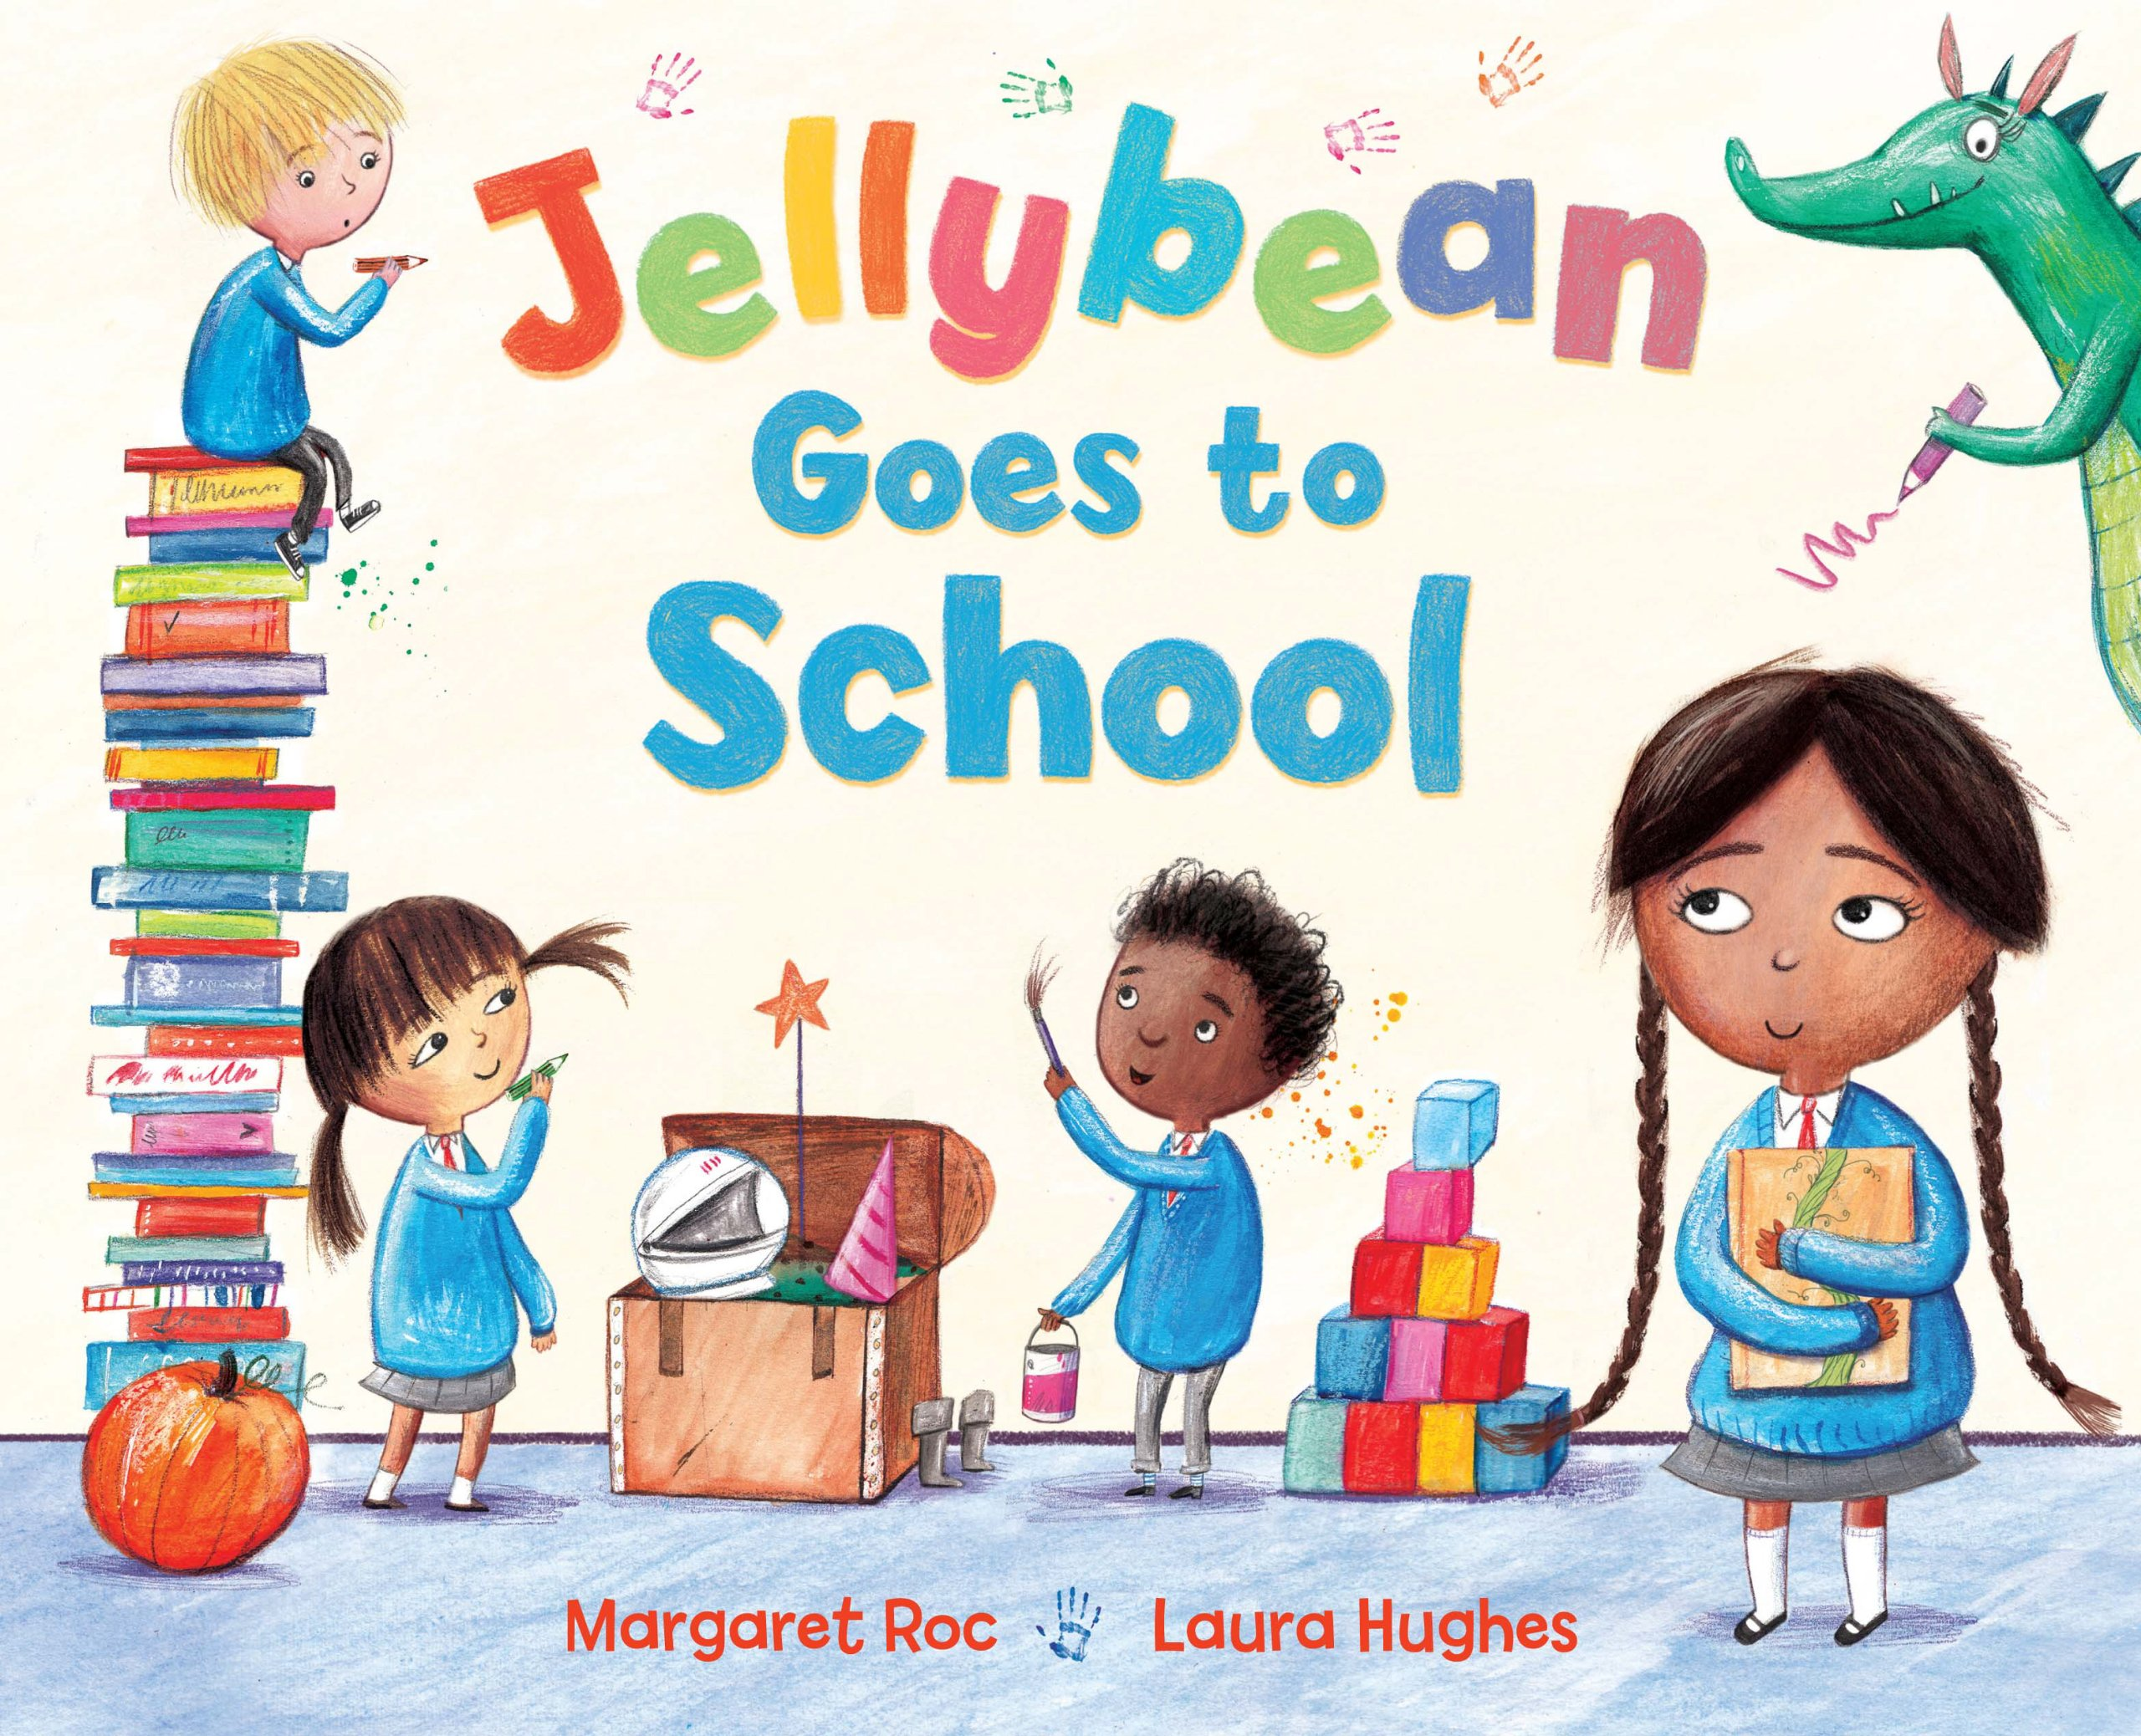 Jellybean Goes to School: Amazon.co.uk: Margaret Roc, Laura Hughes ...